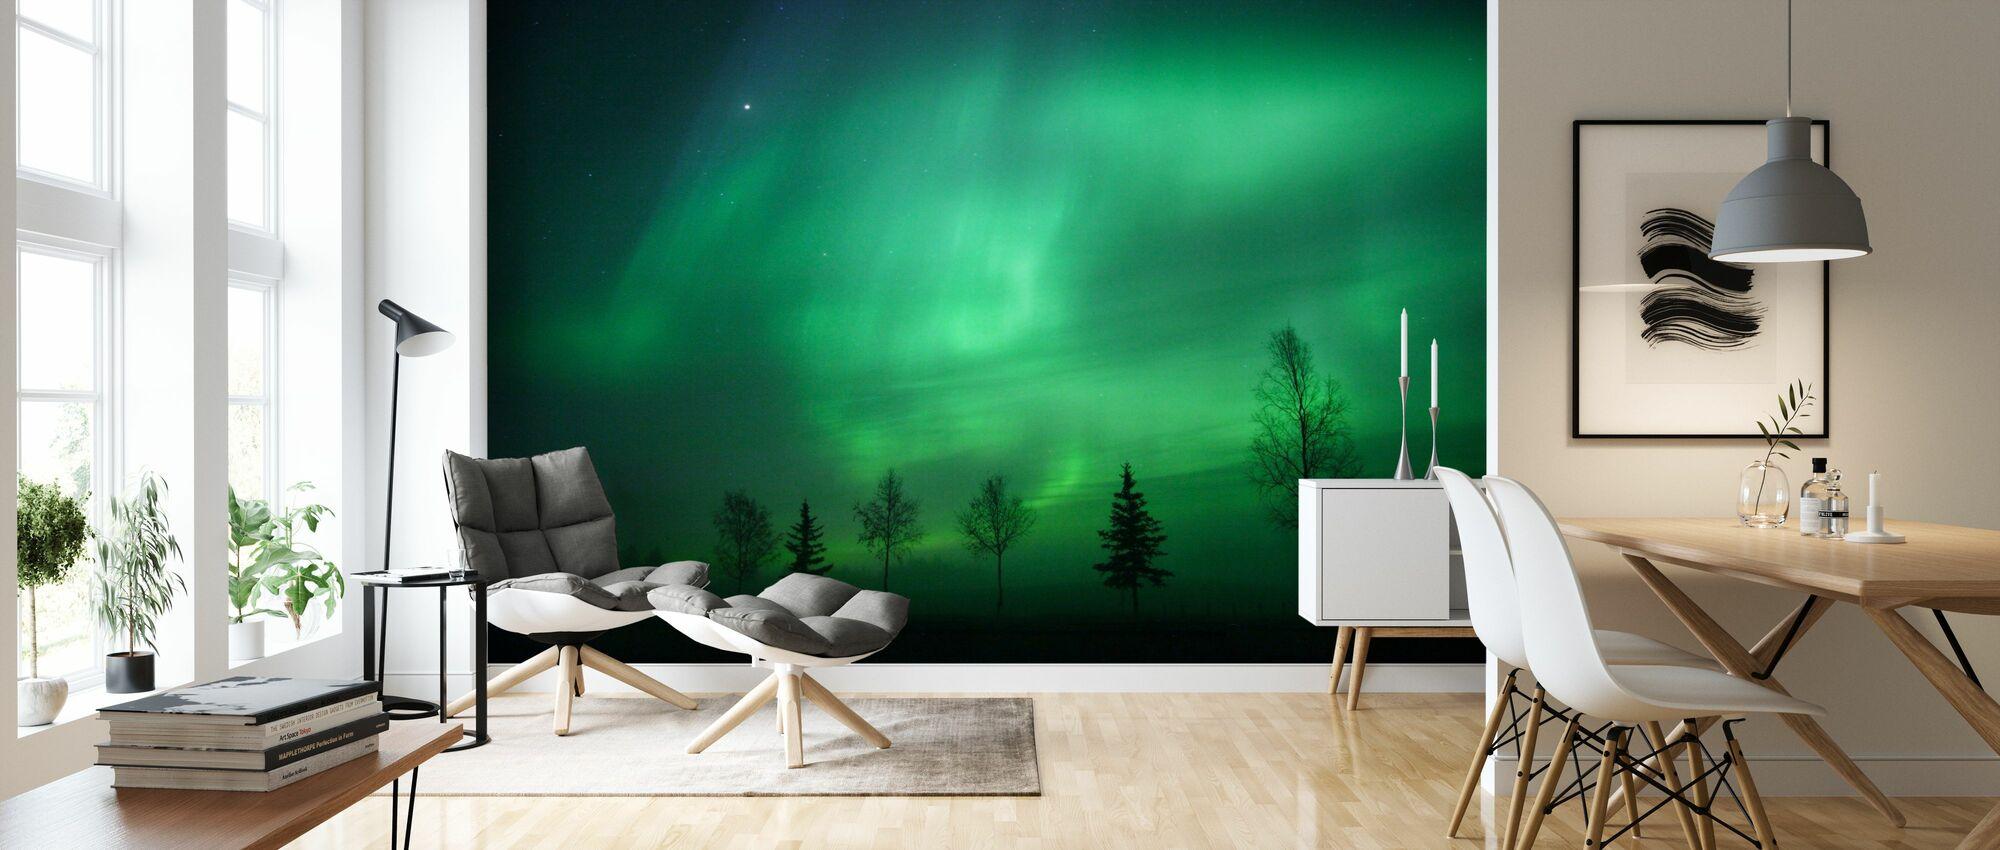 Nordiska Ljus - Tapet - Vardagsrum